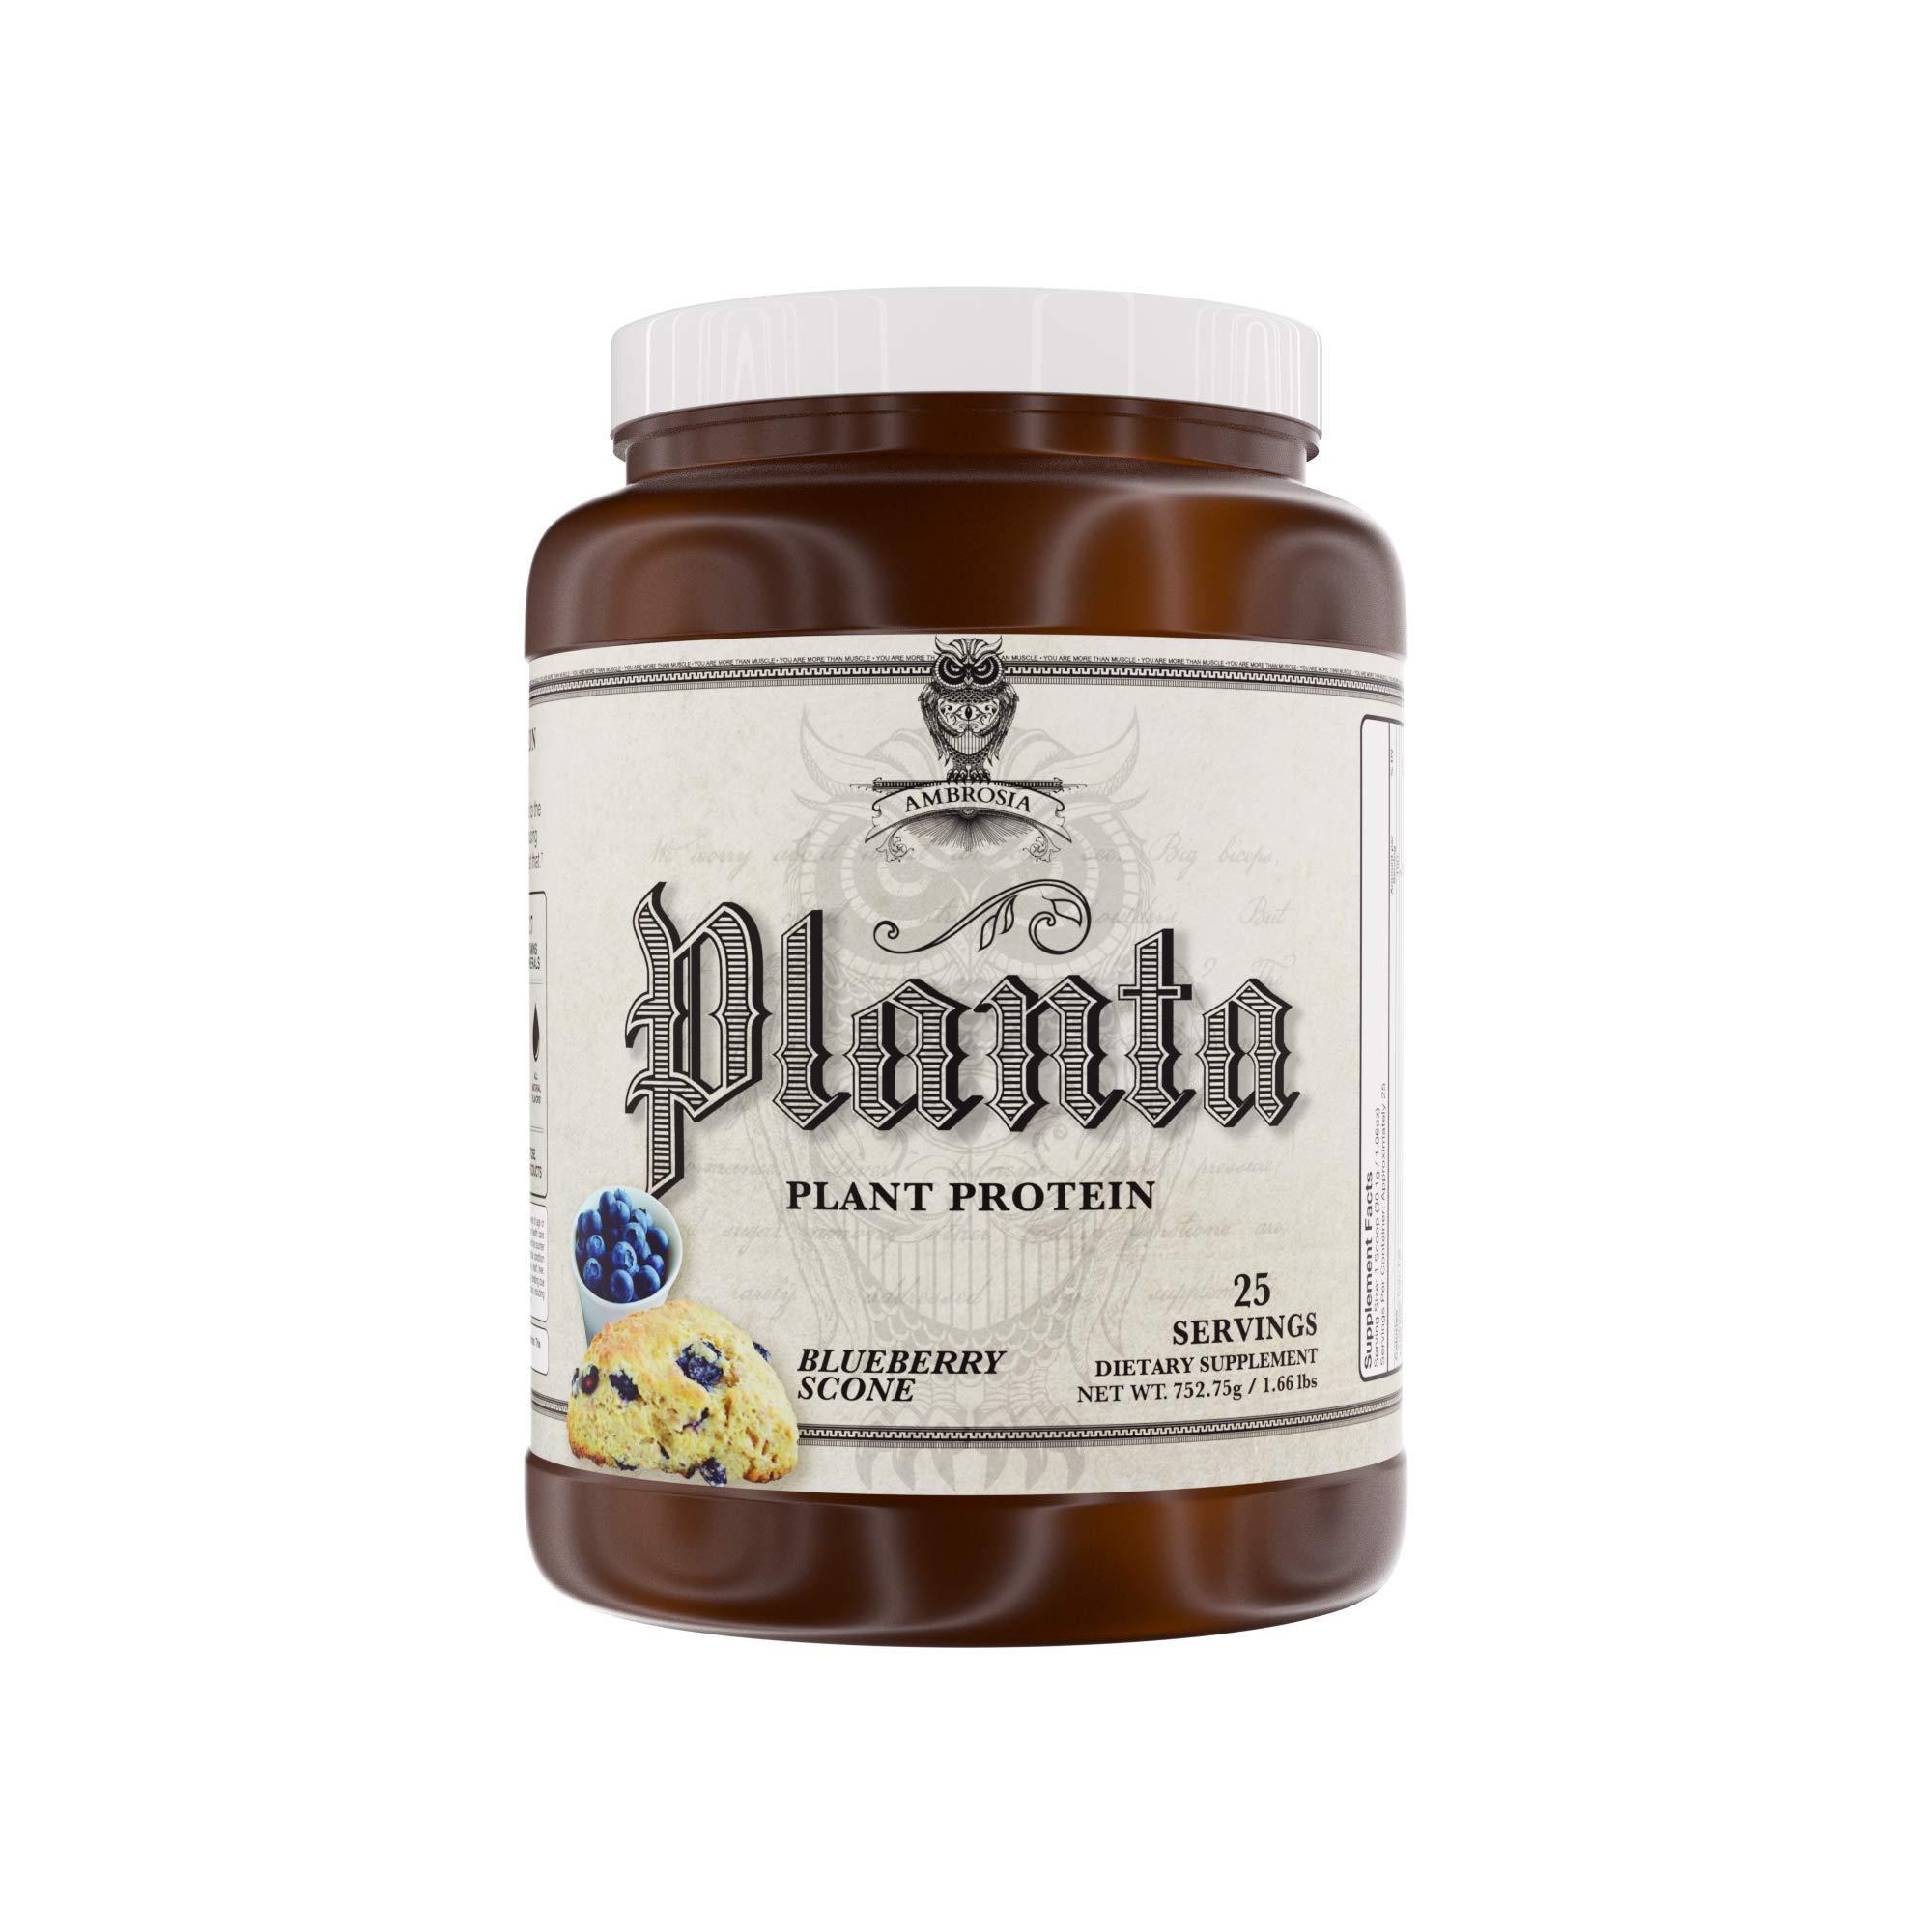 Ambrosia Planta | Organic Plant-Based Protein | 25 Servings (Blueberry Scone)